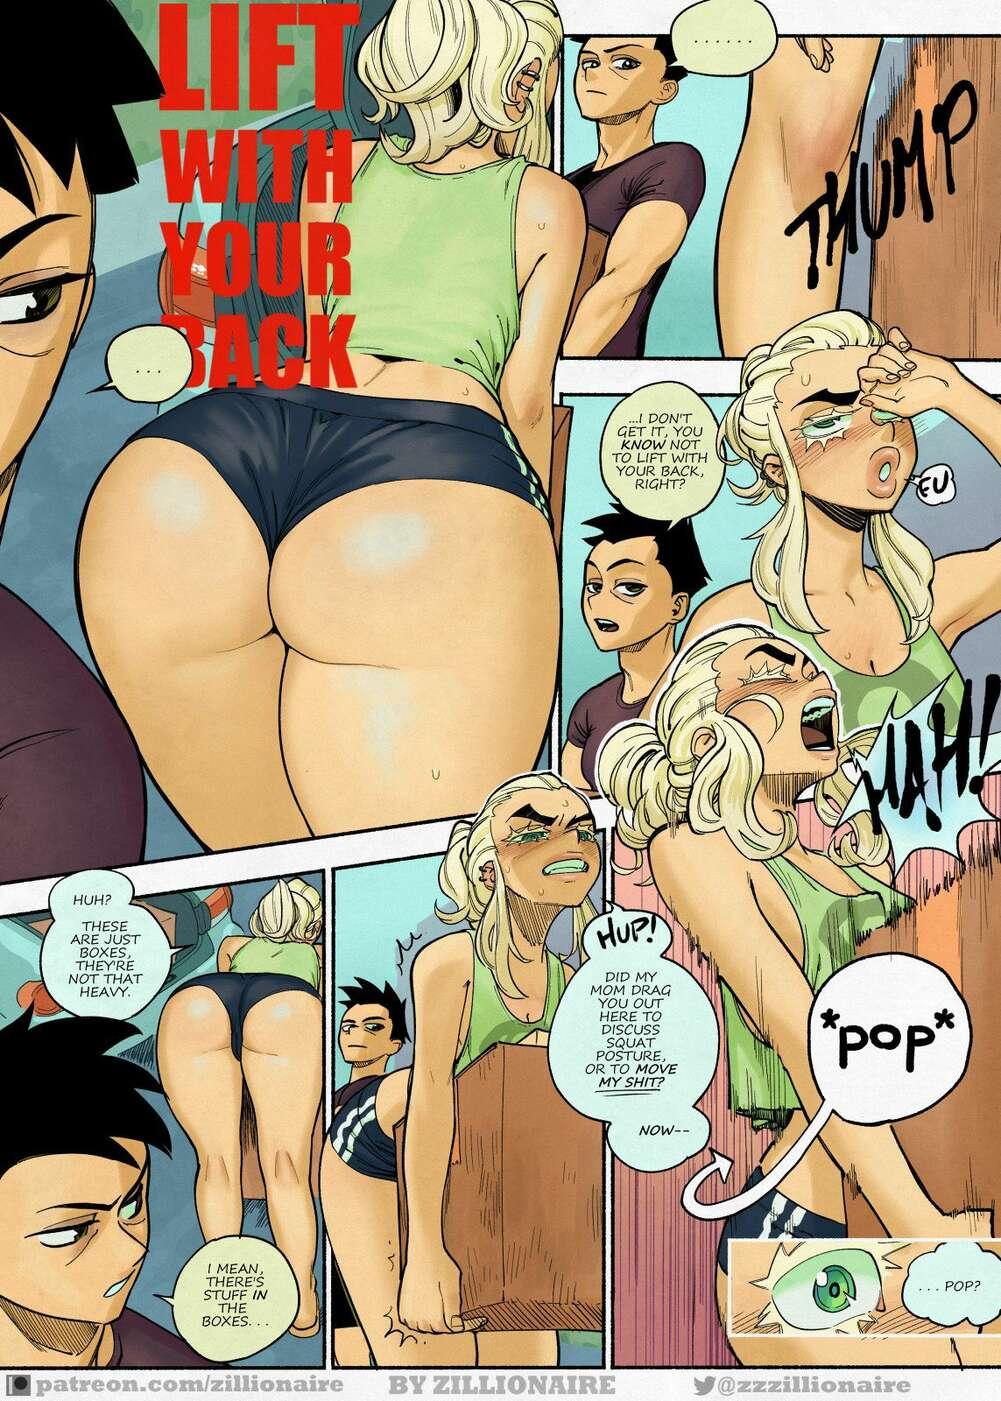 Comics erotic Cuckold cartoons.